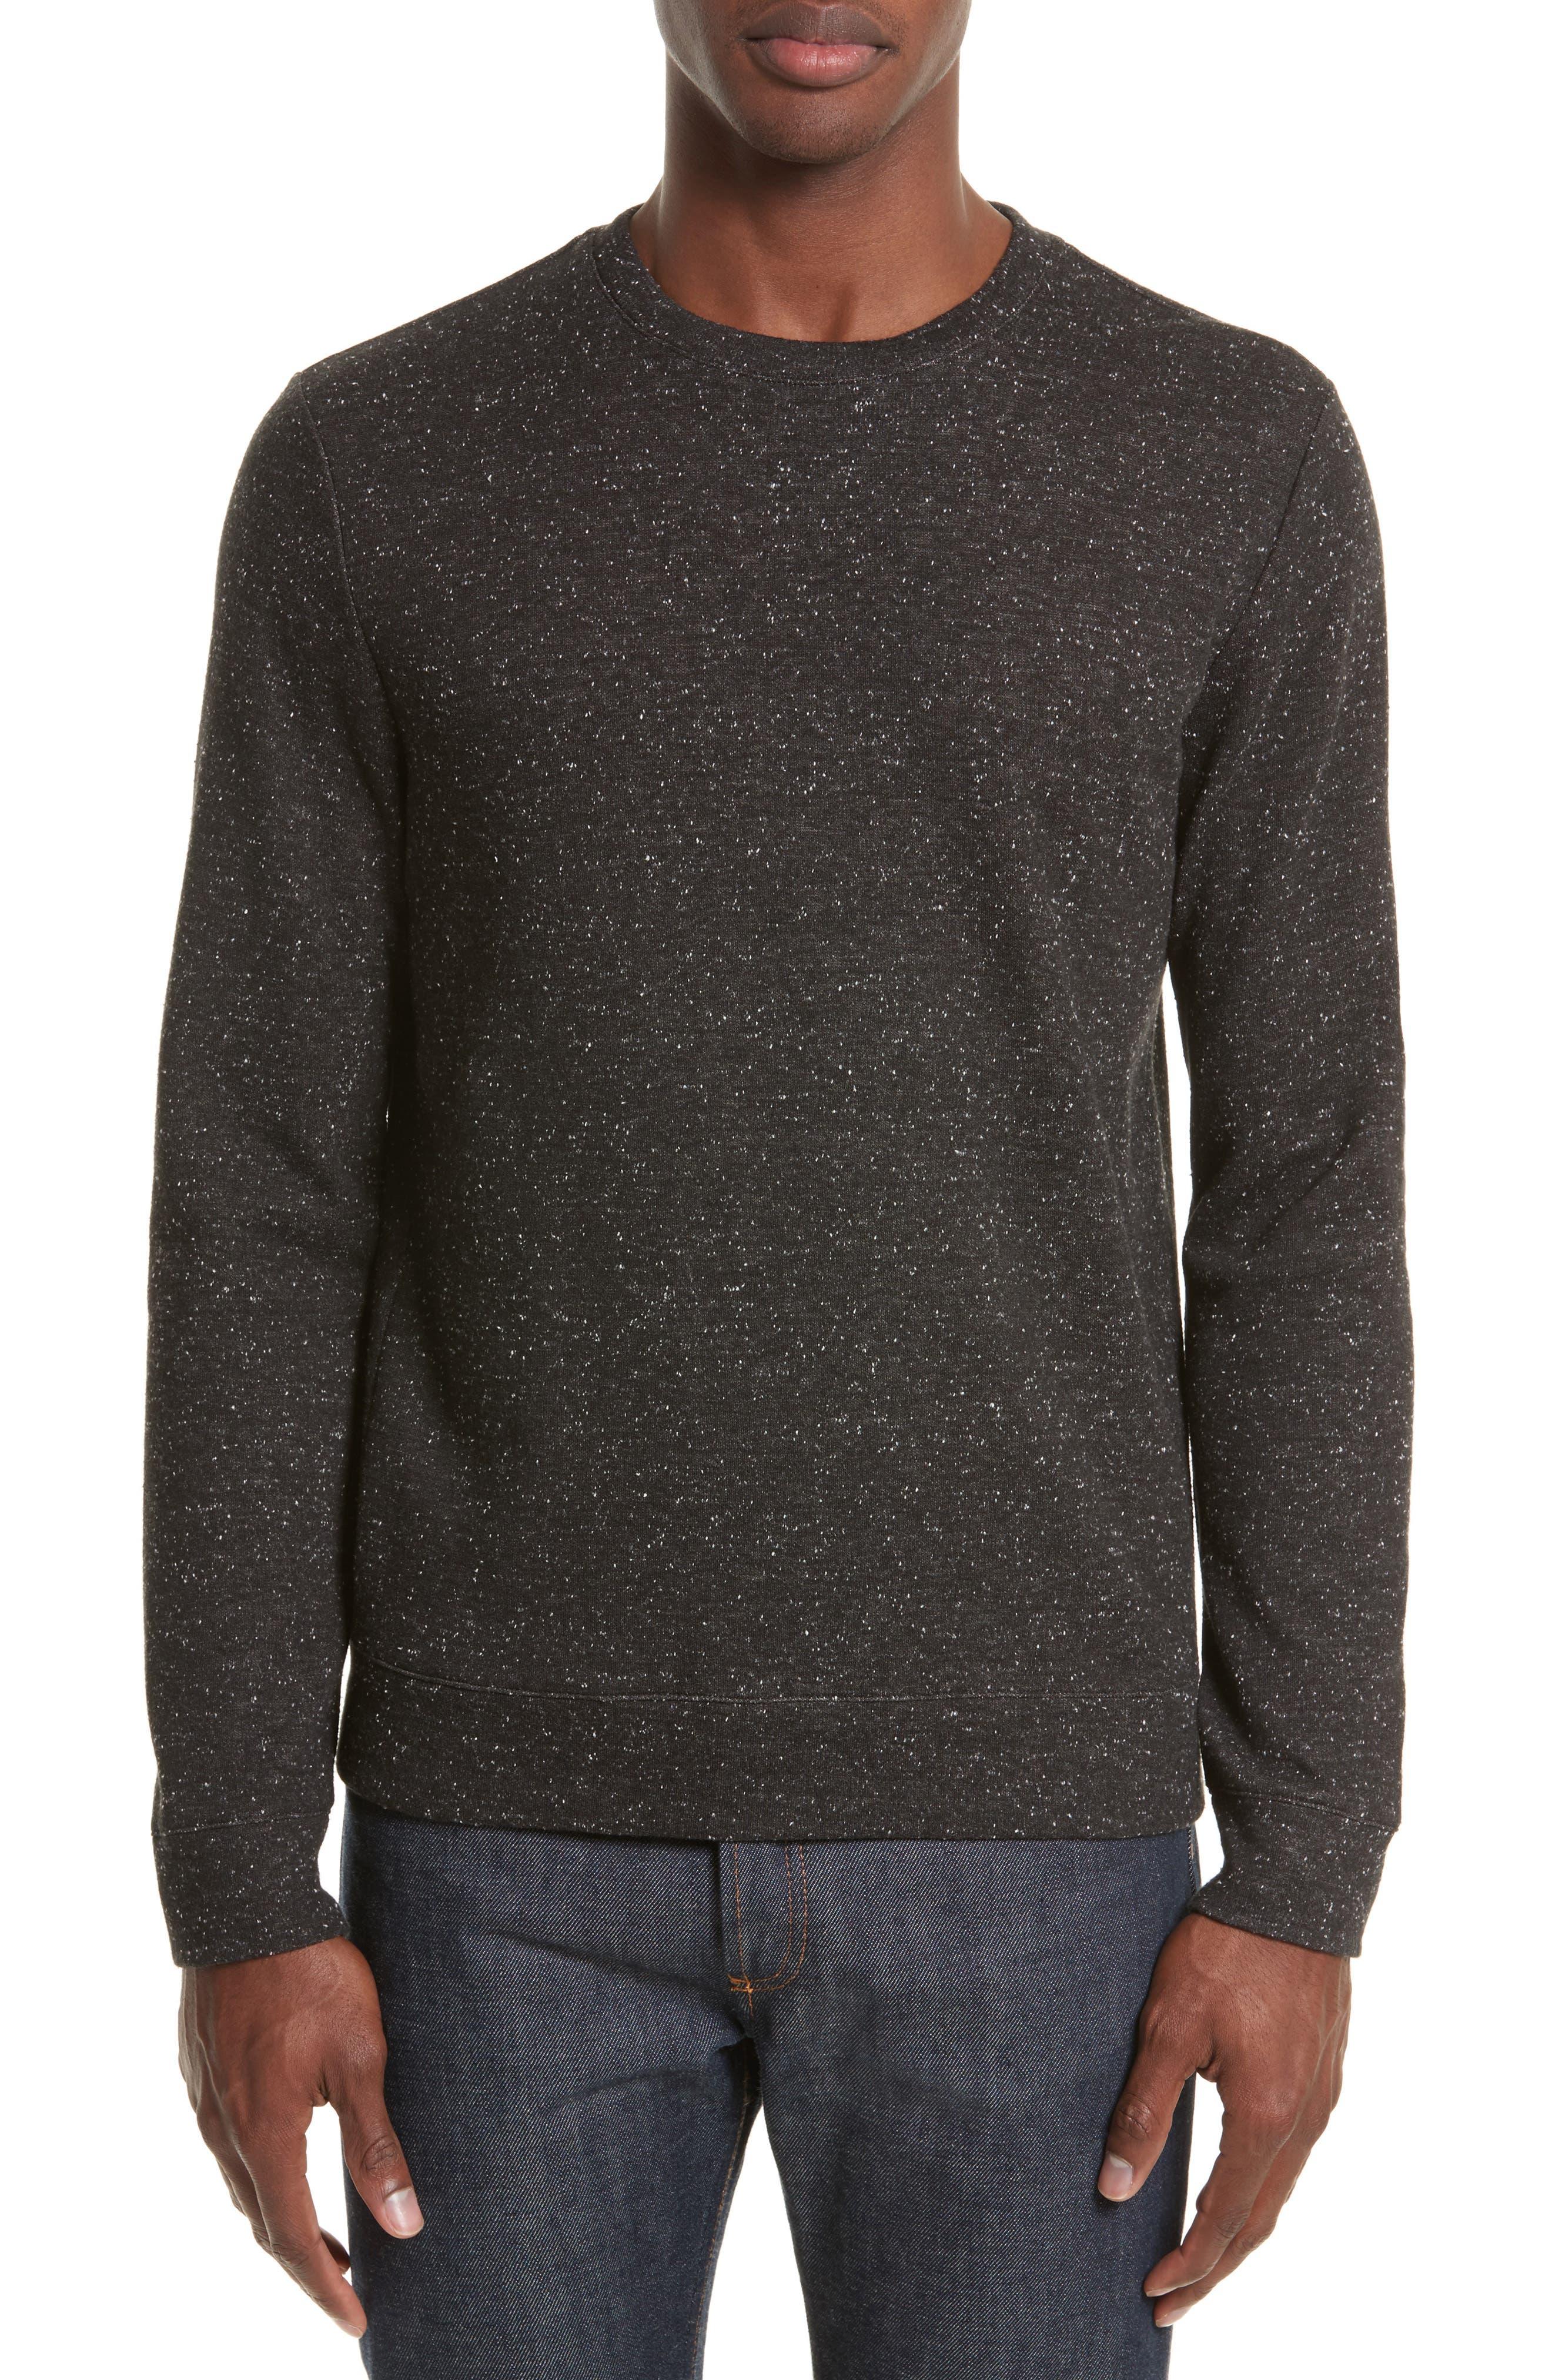 Speckle Sweat Track Sweater,                         Main,                         color, 065